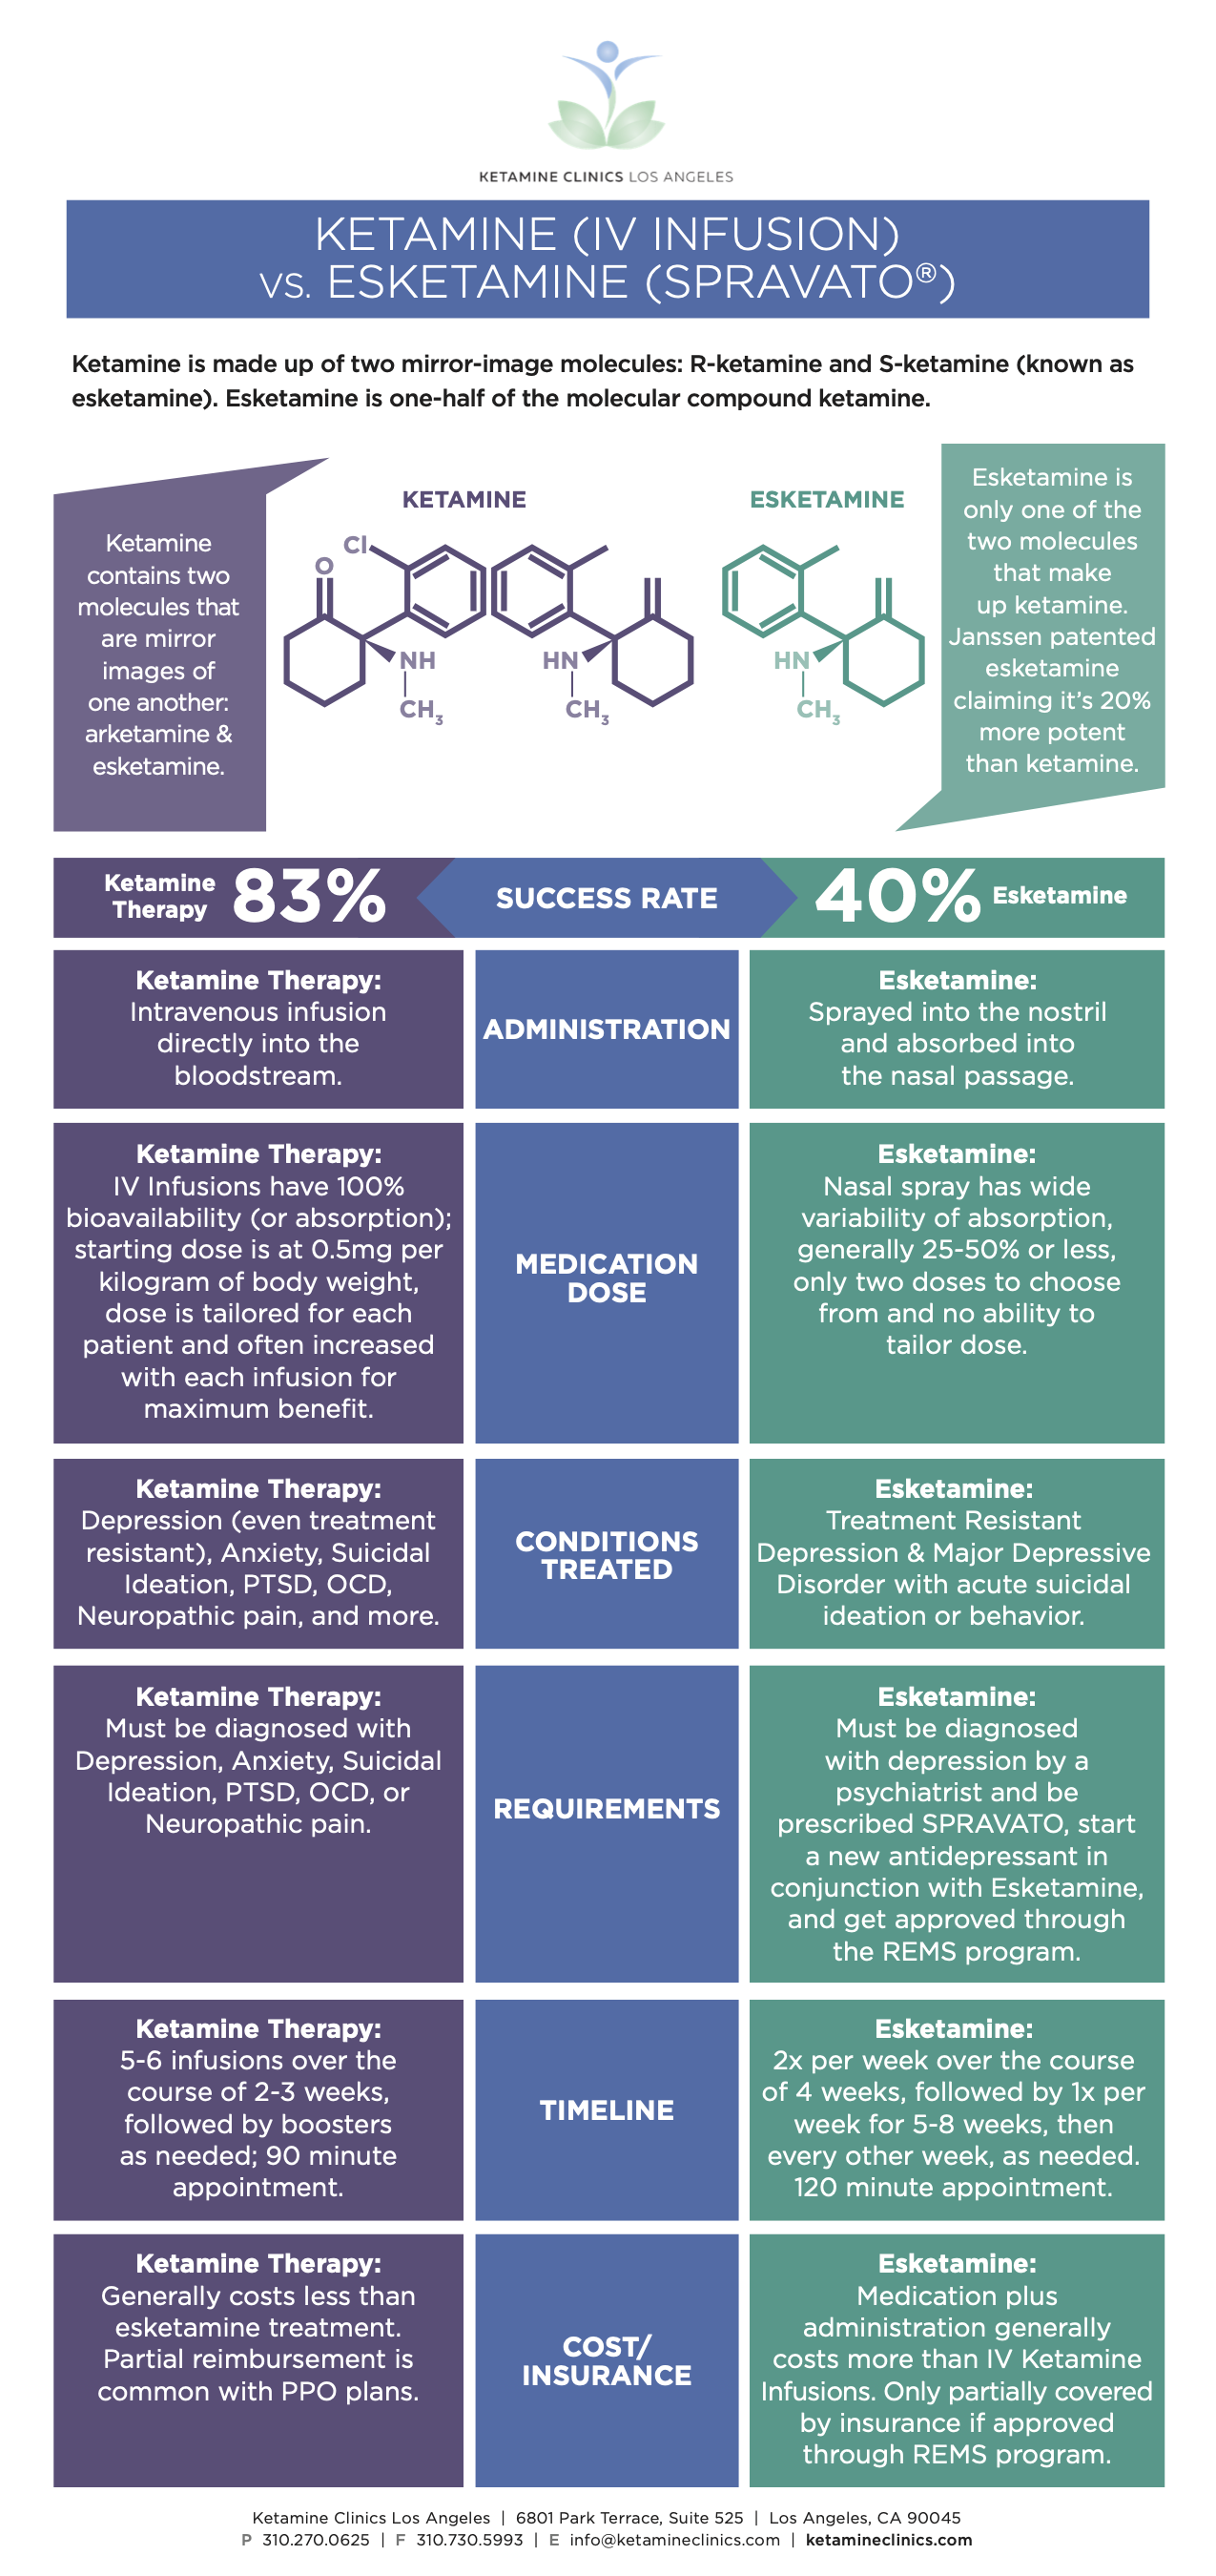 Ketamine v Esketamine Infographic